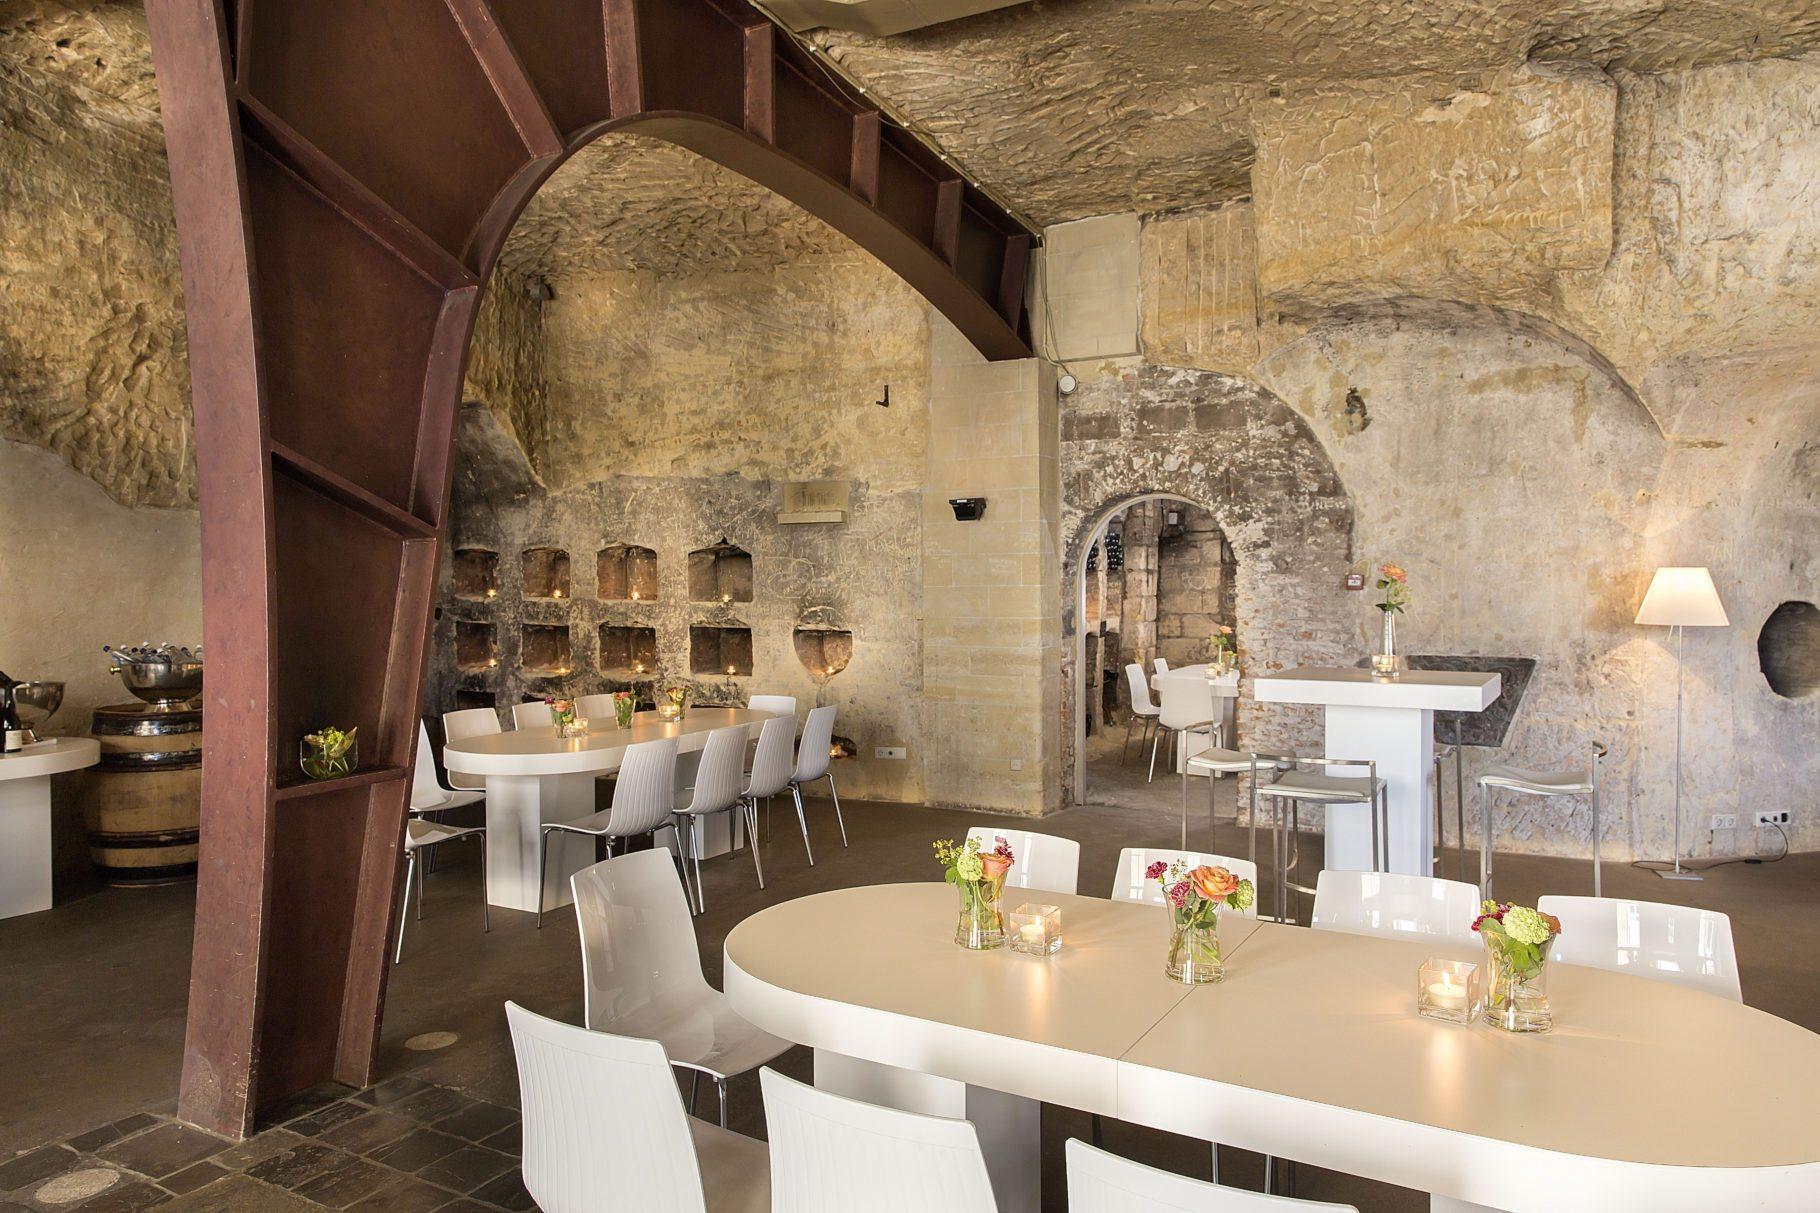 Wijnkelders in mergelgrotten Maastricht | Château Neercanne